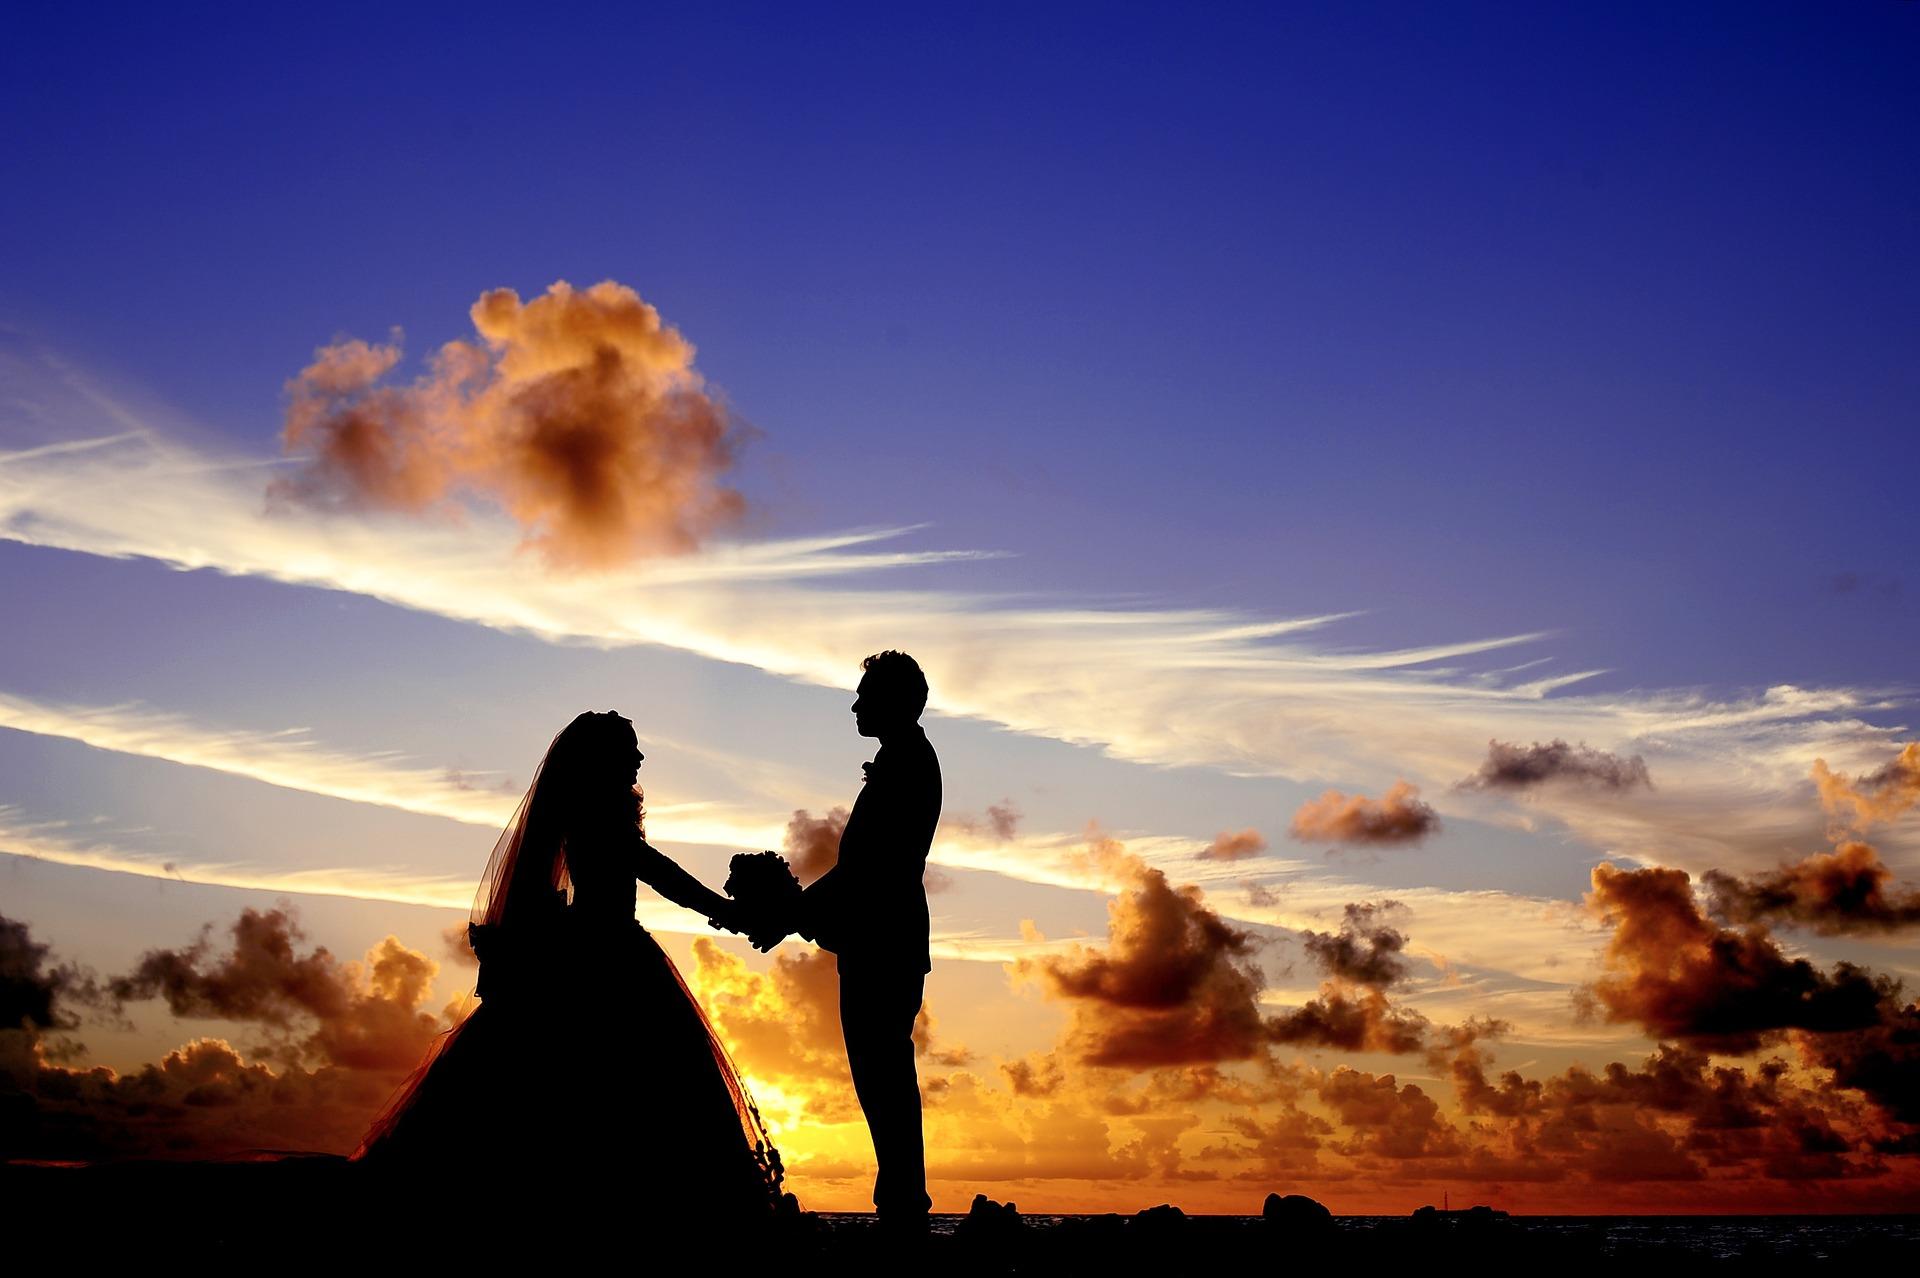 Bondage in marriage